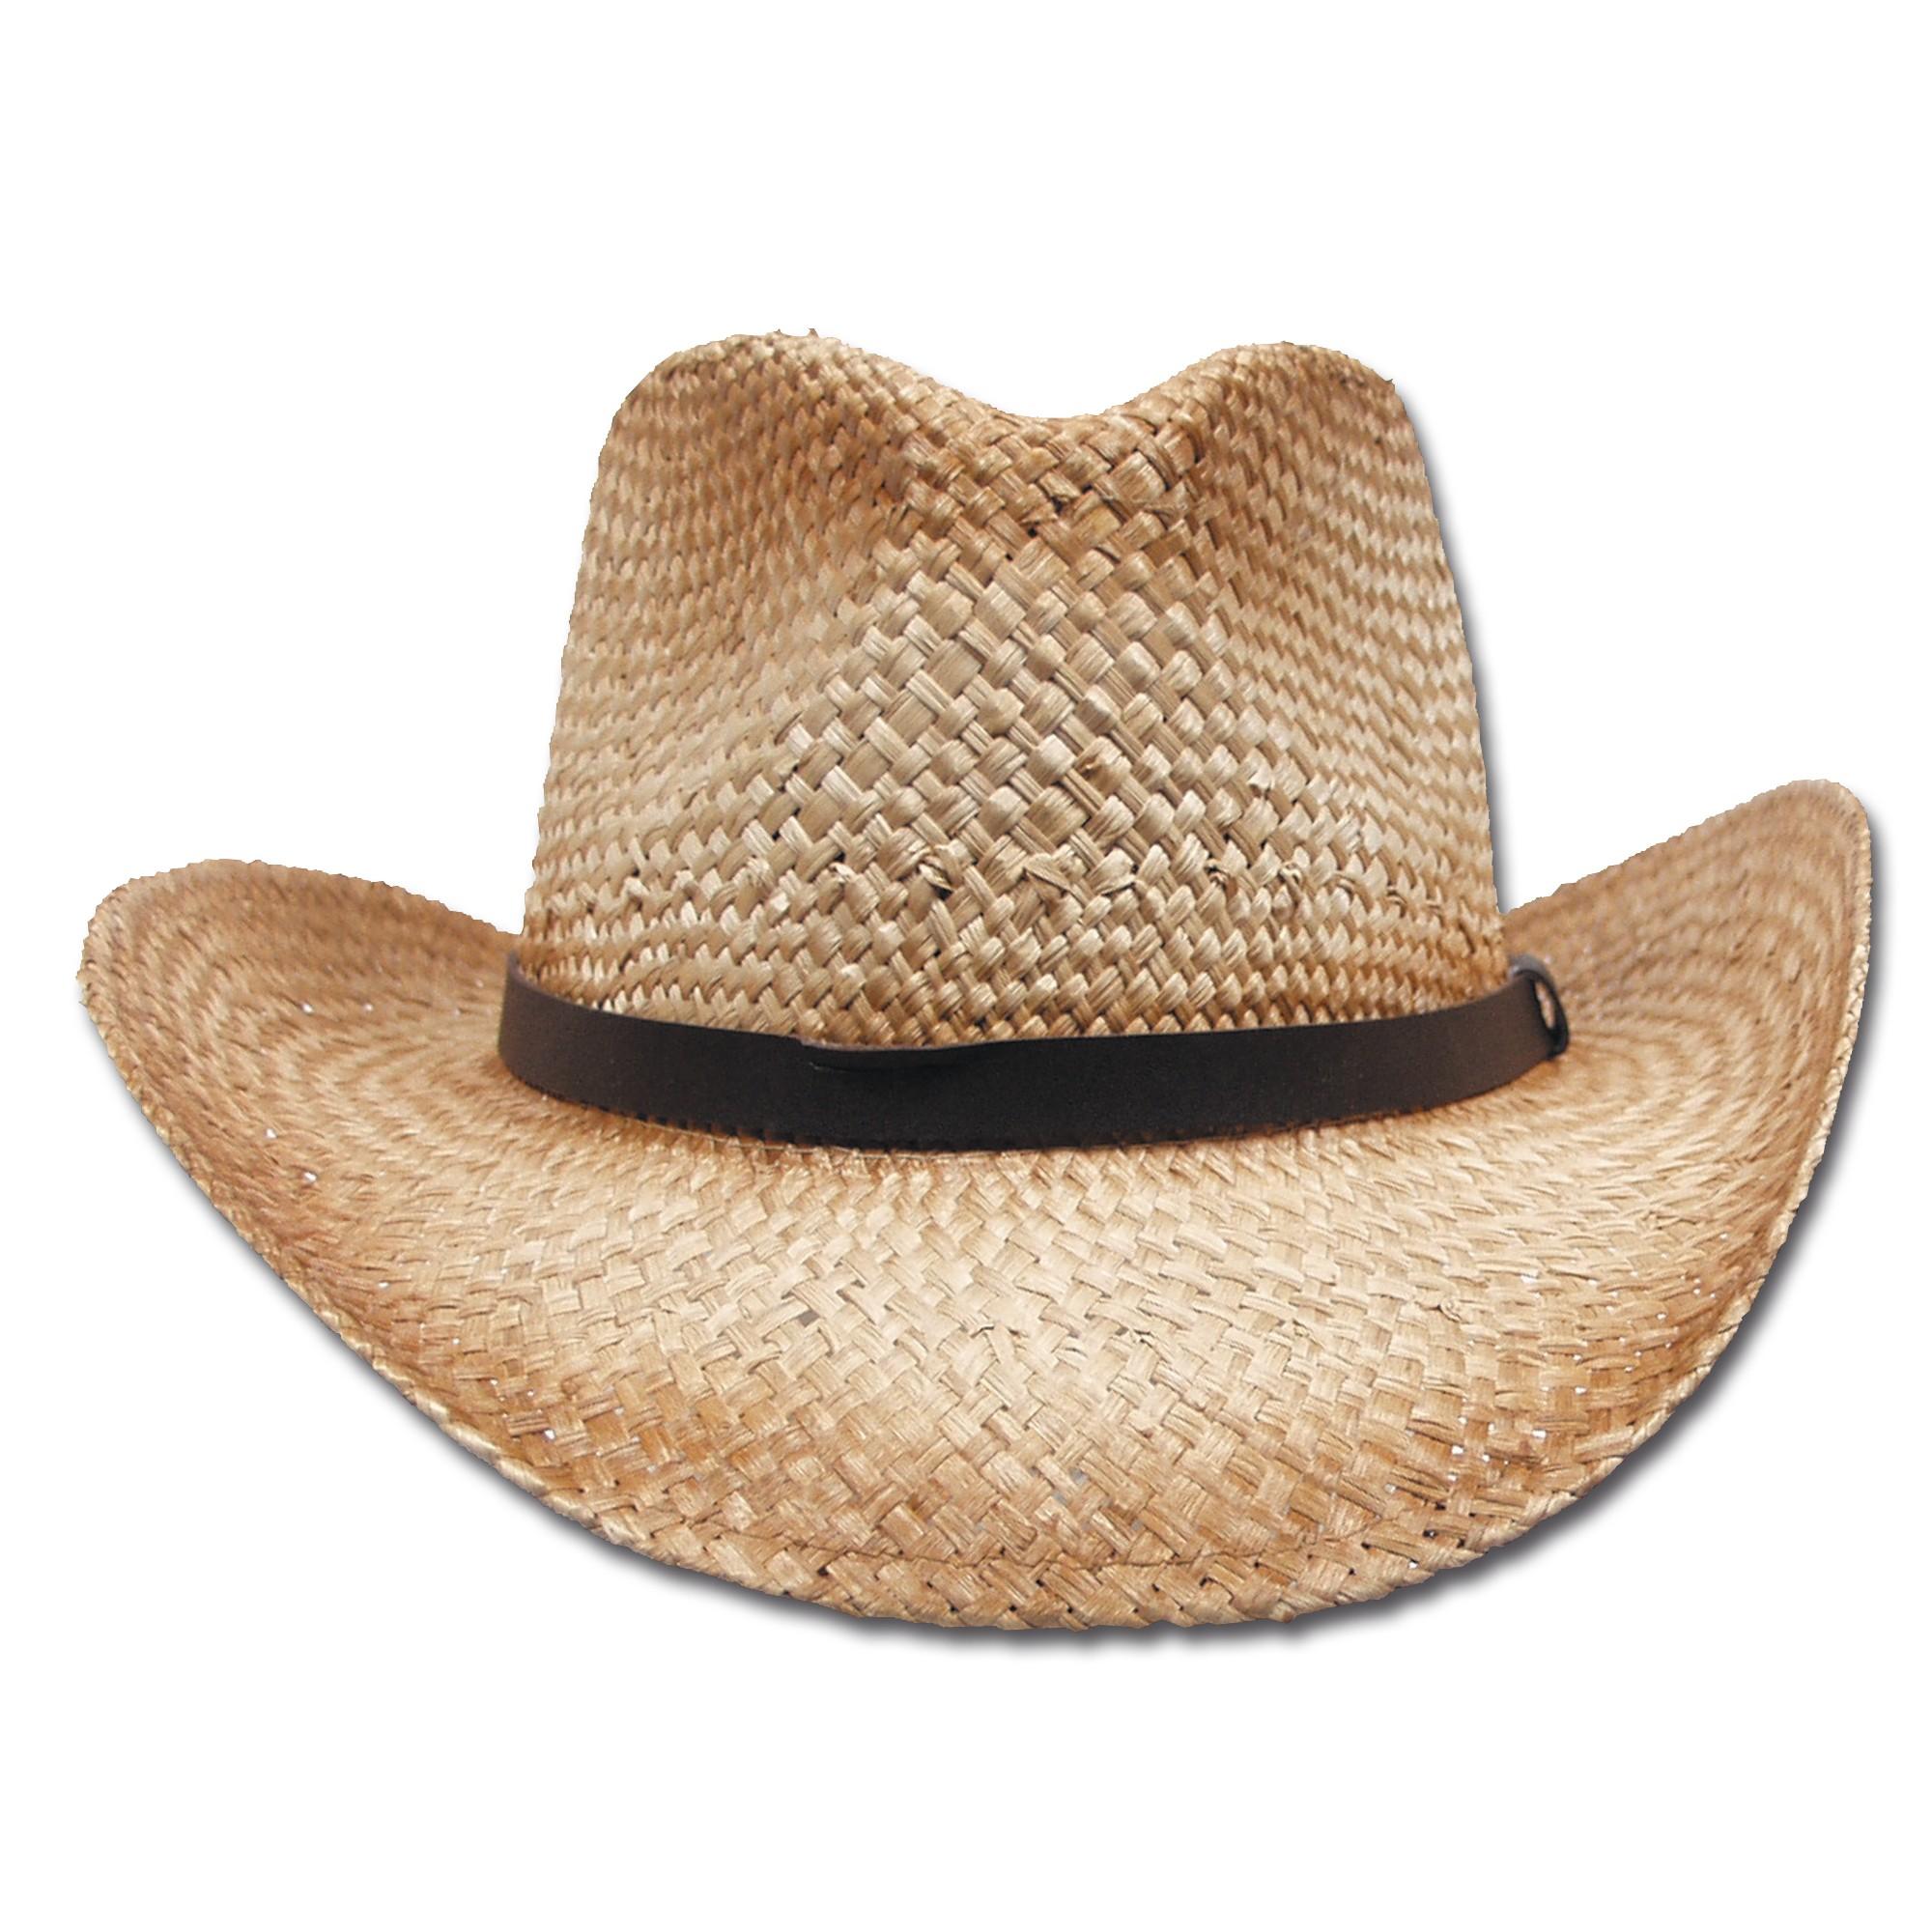 Strohhut mit Hutband